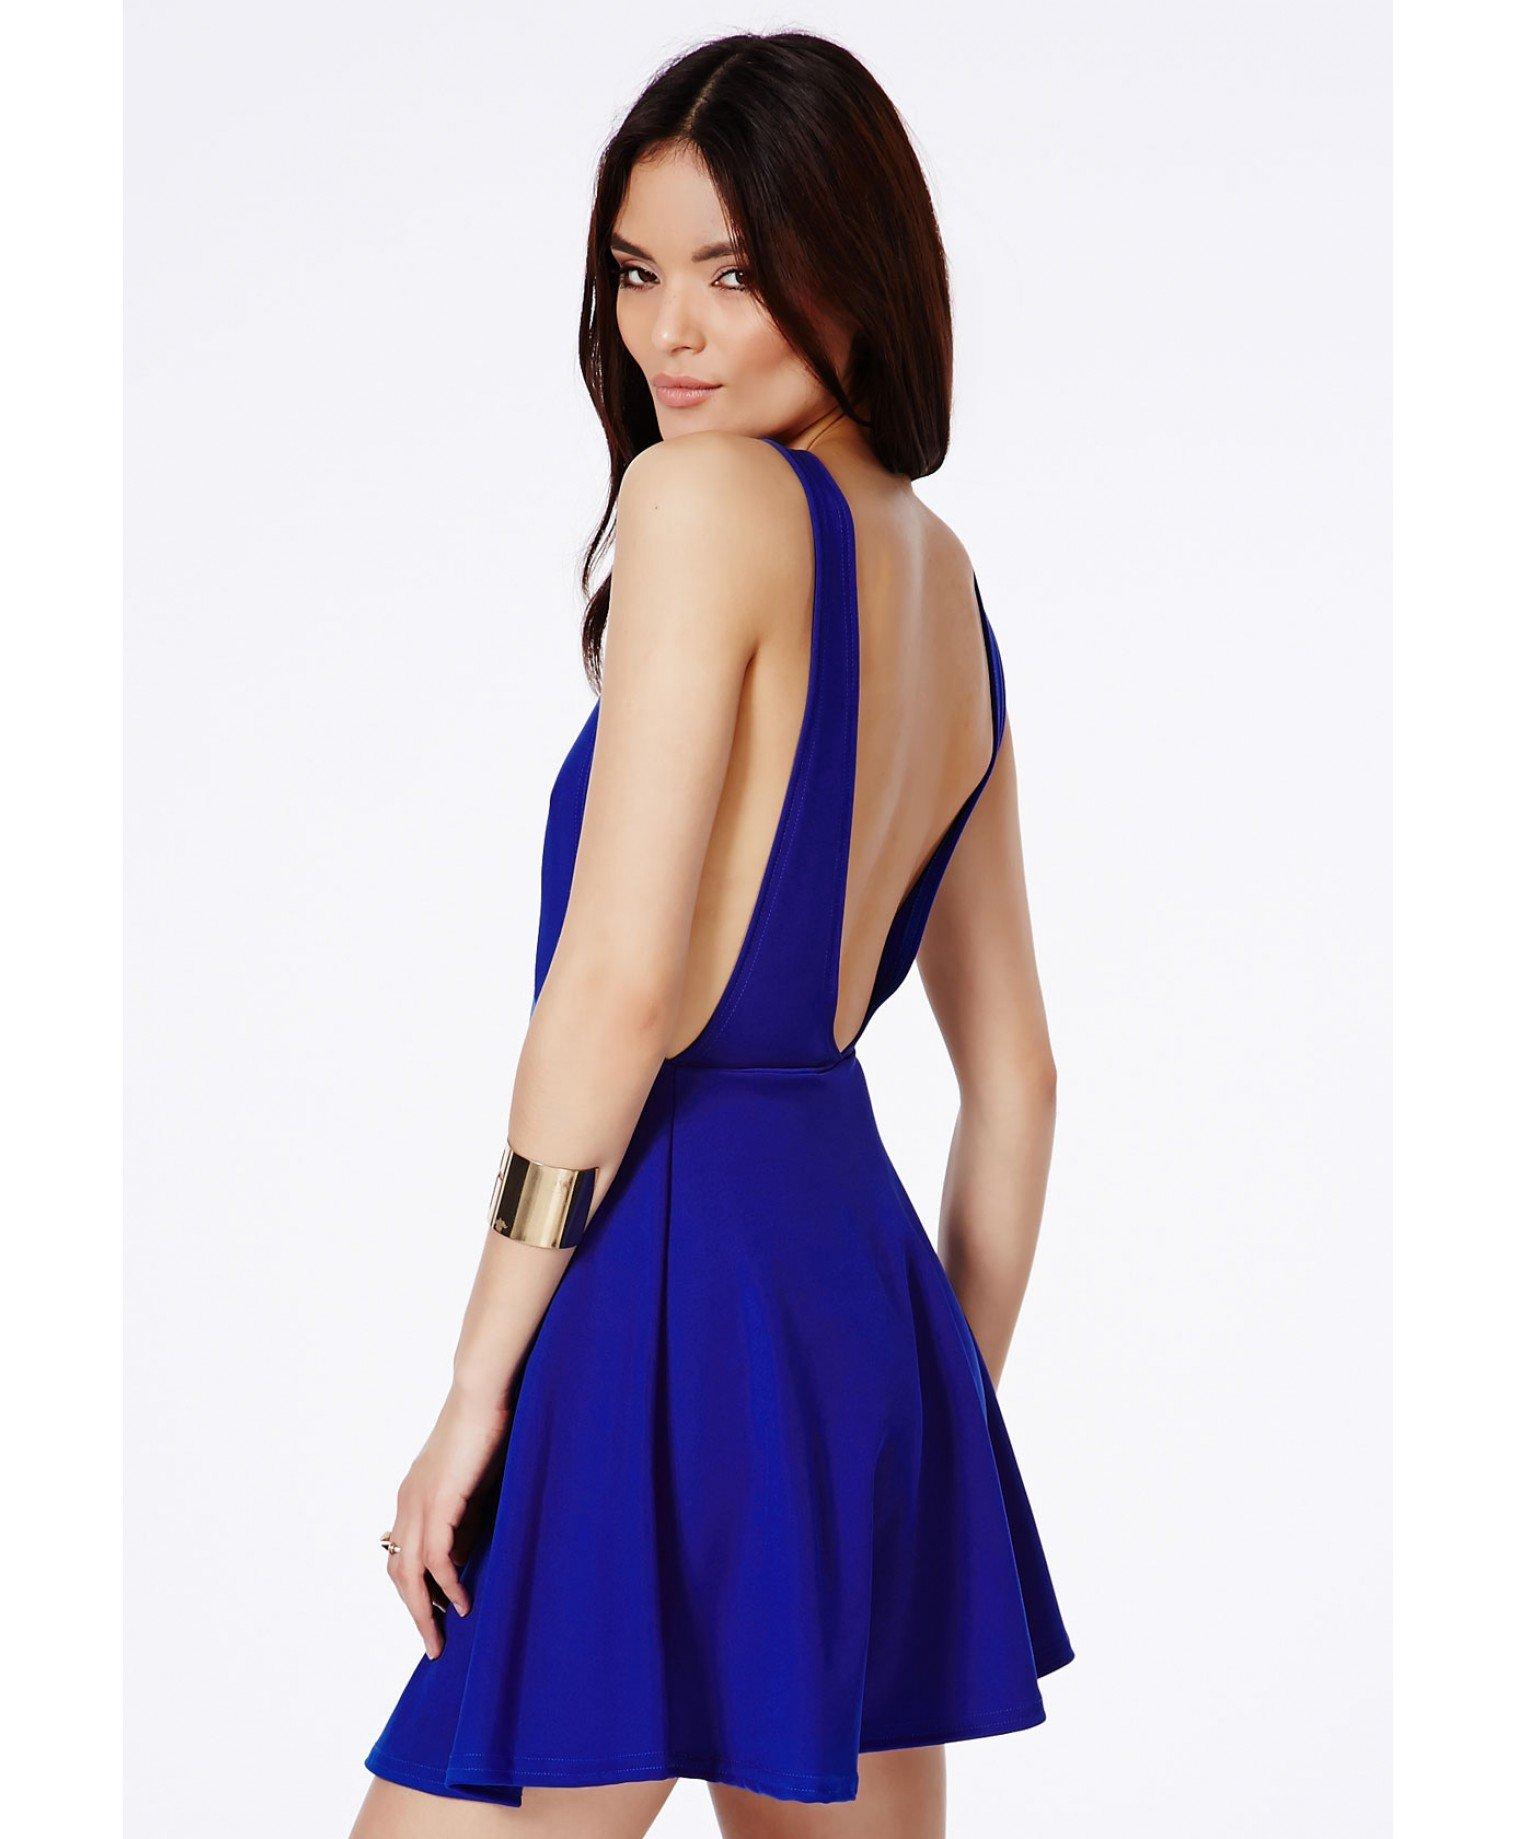 Blue Backless Dress Photo Album - Reikian